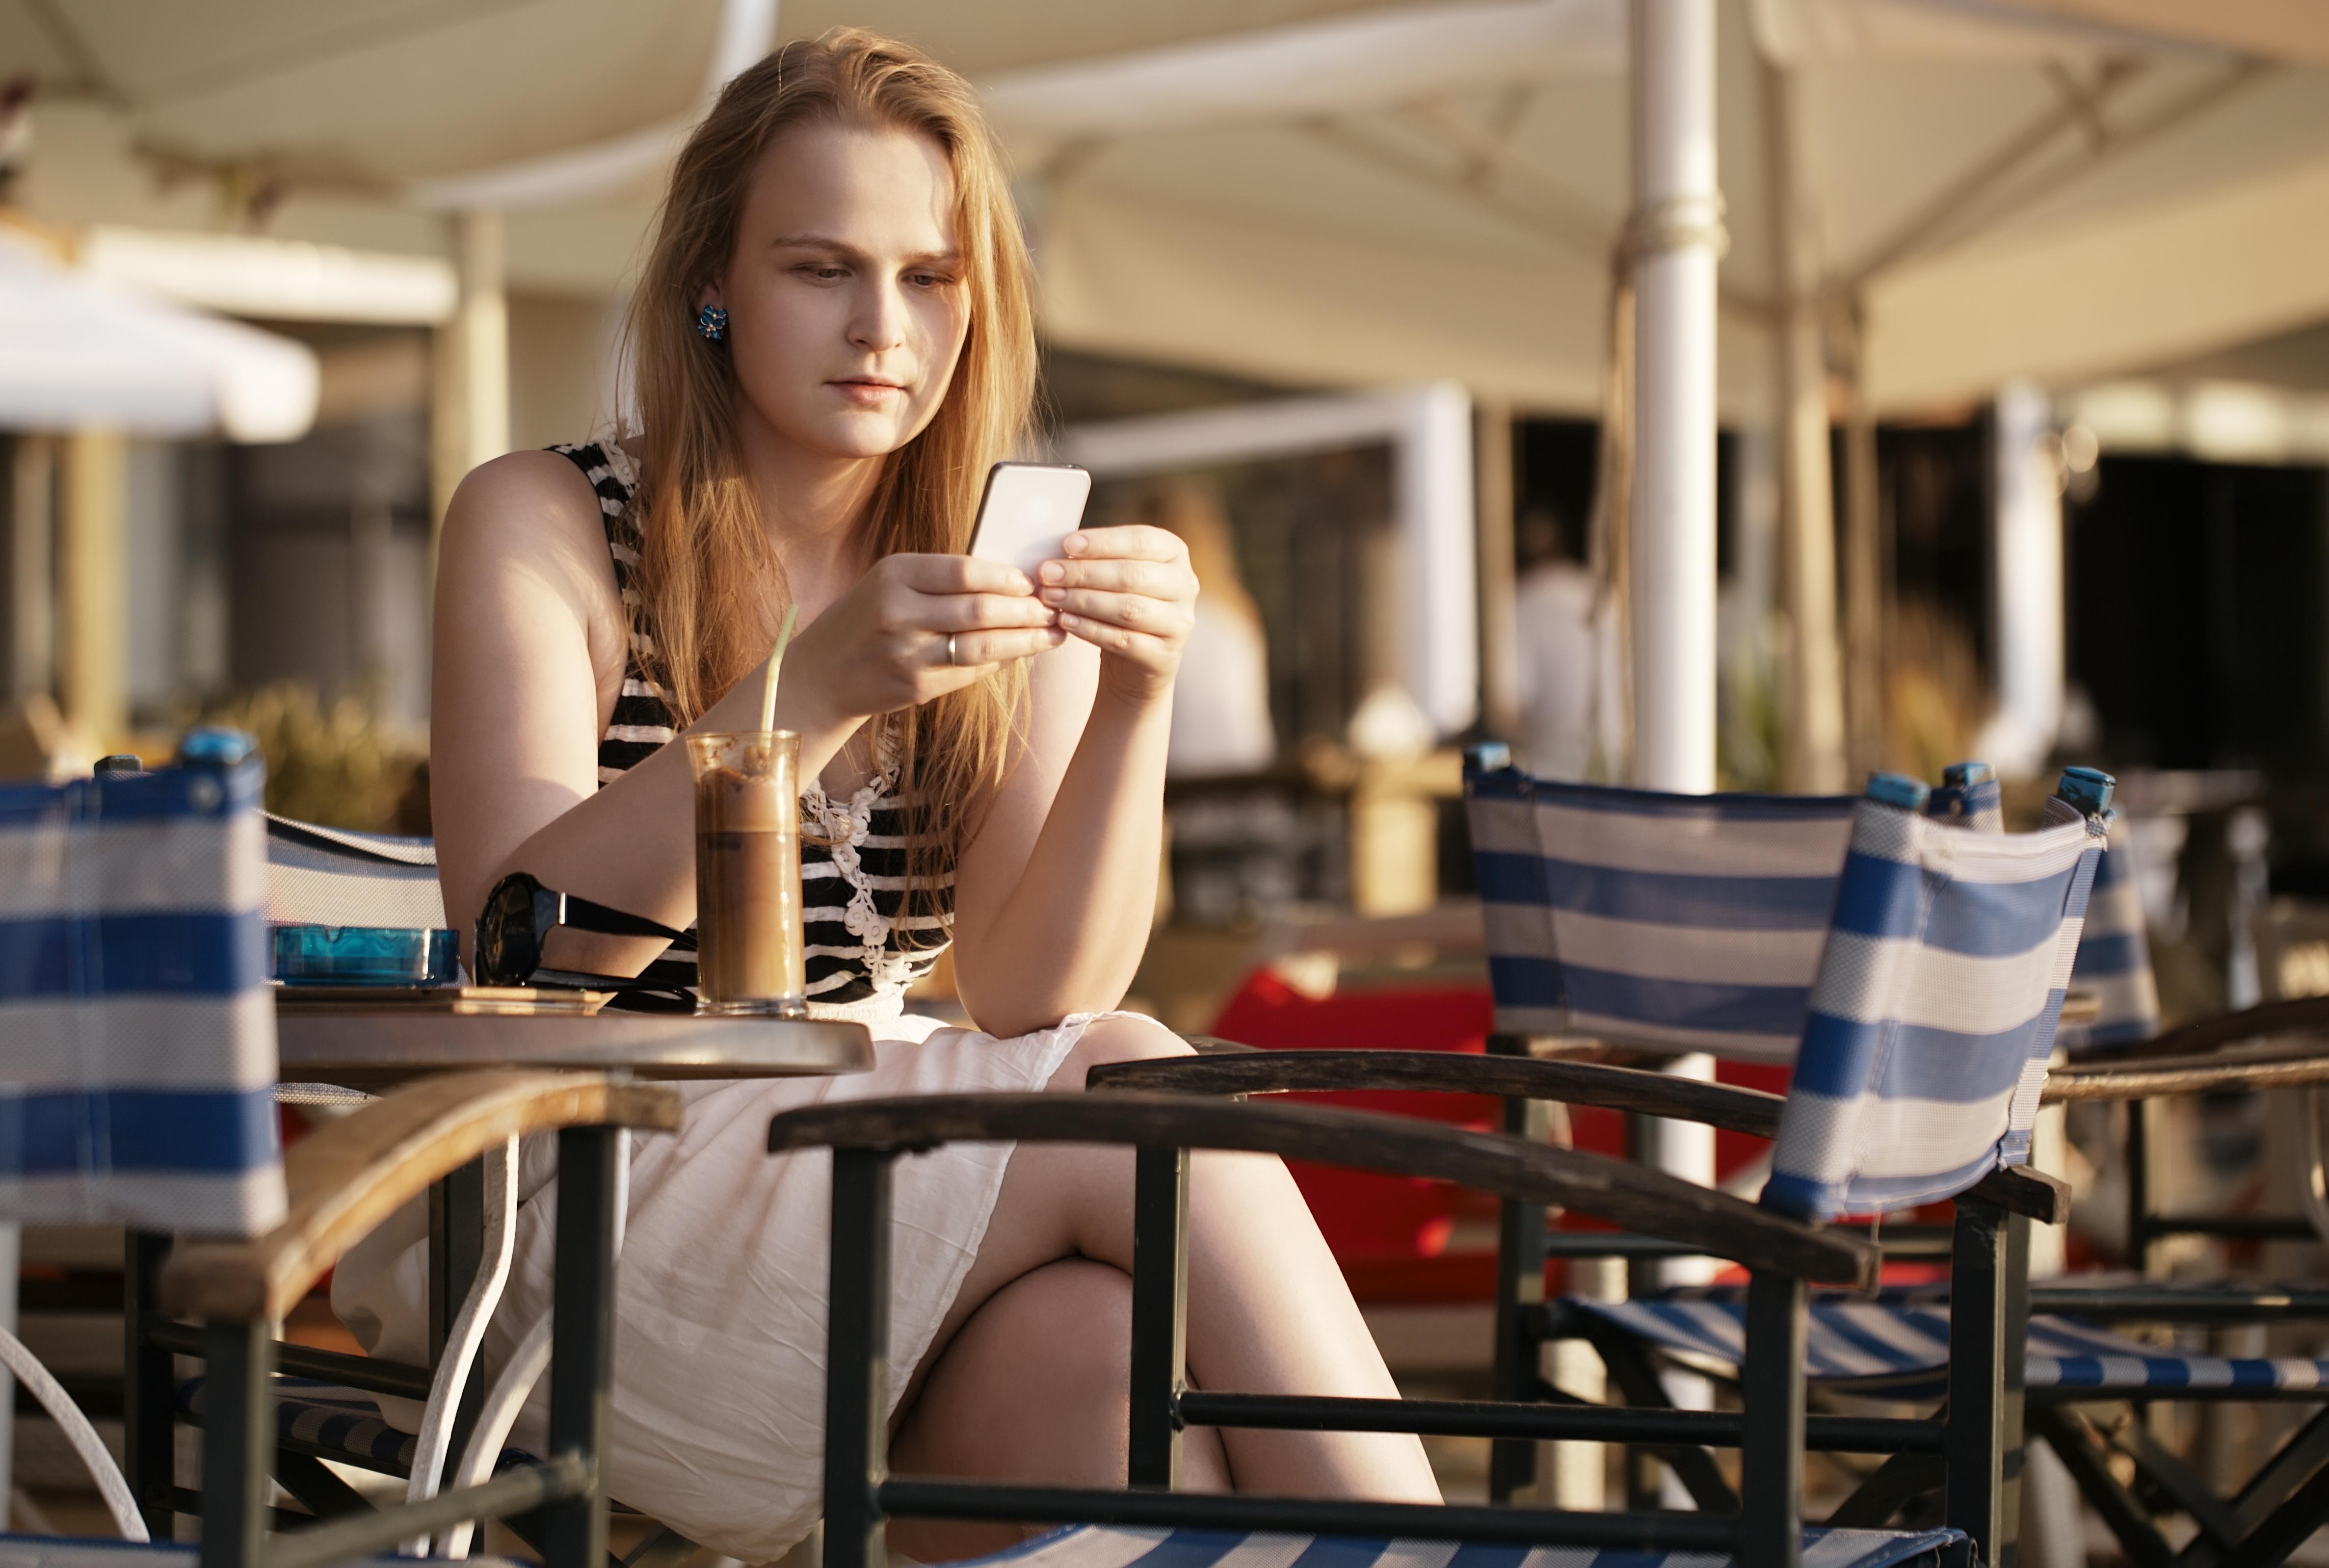 girl-on-phone-restaurant_top-guest-wifi-concerns.jpg